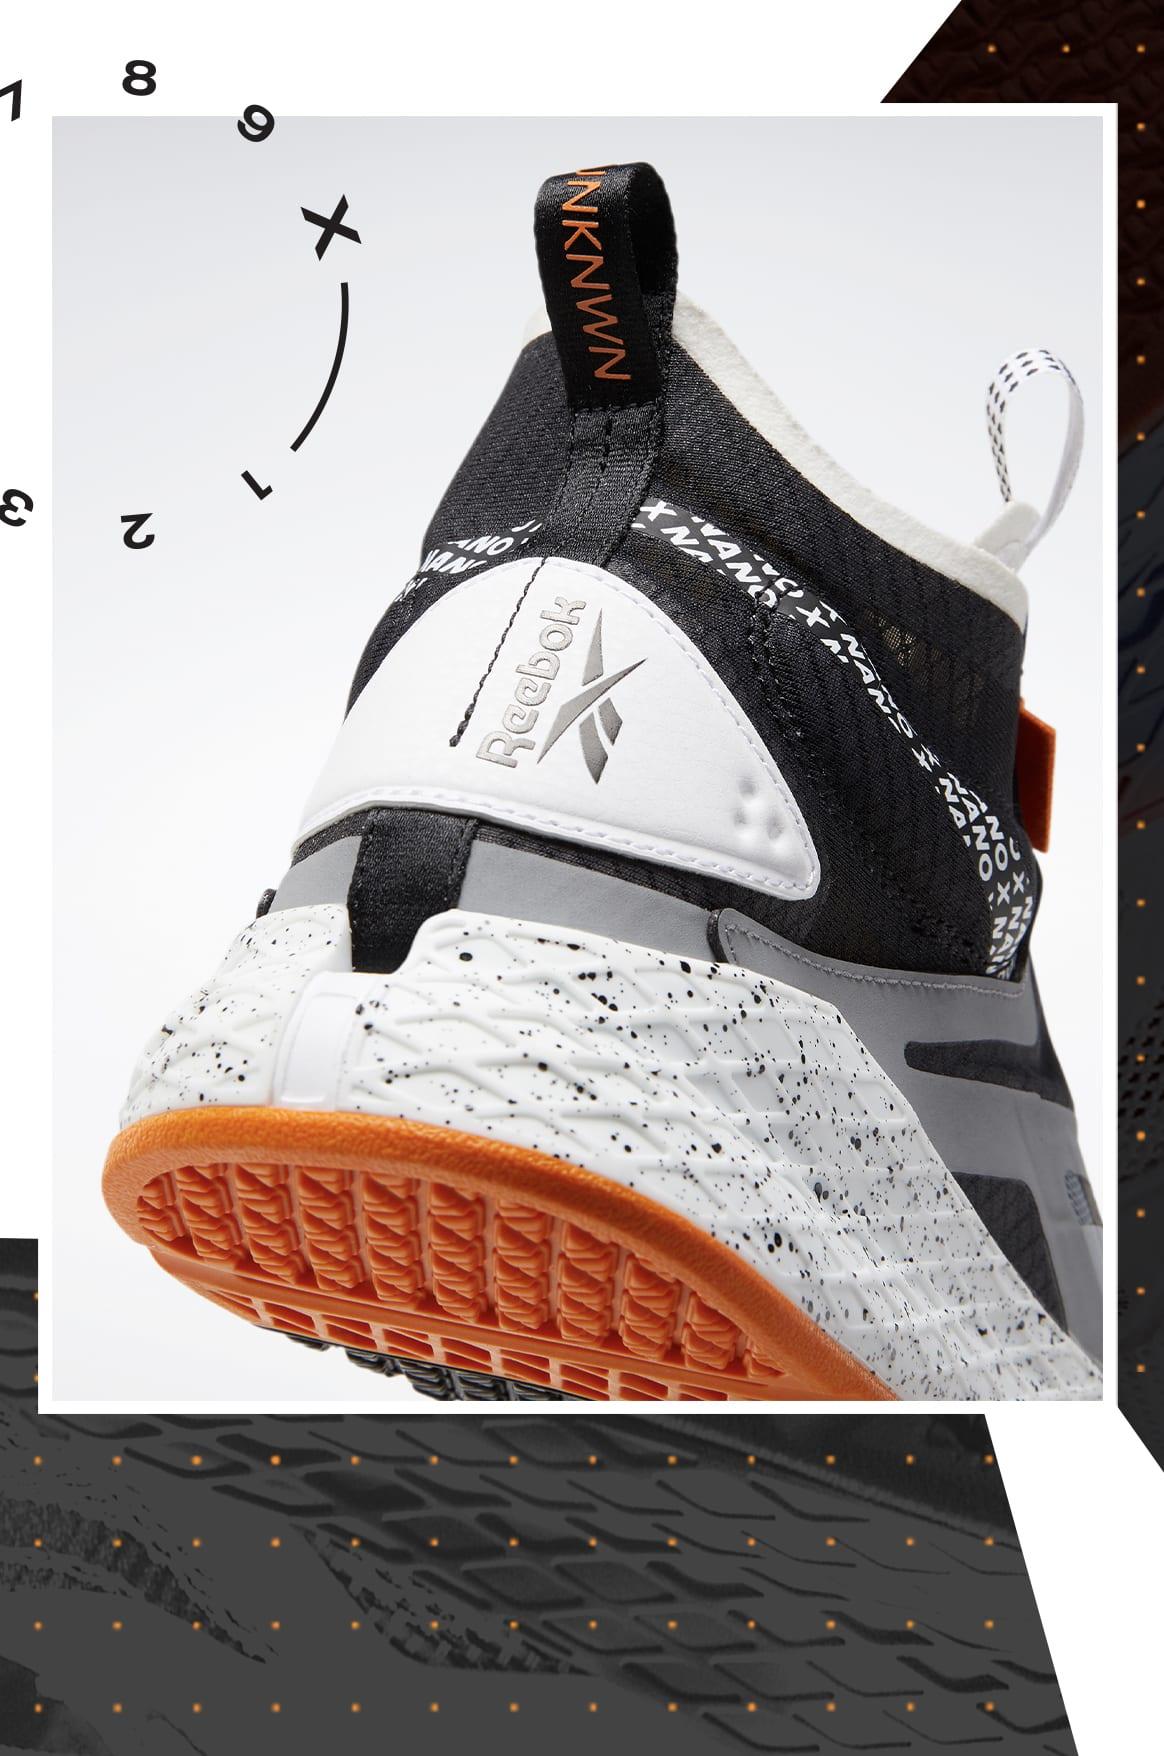 reebok metasploit shoes